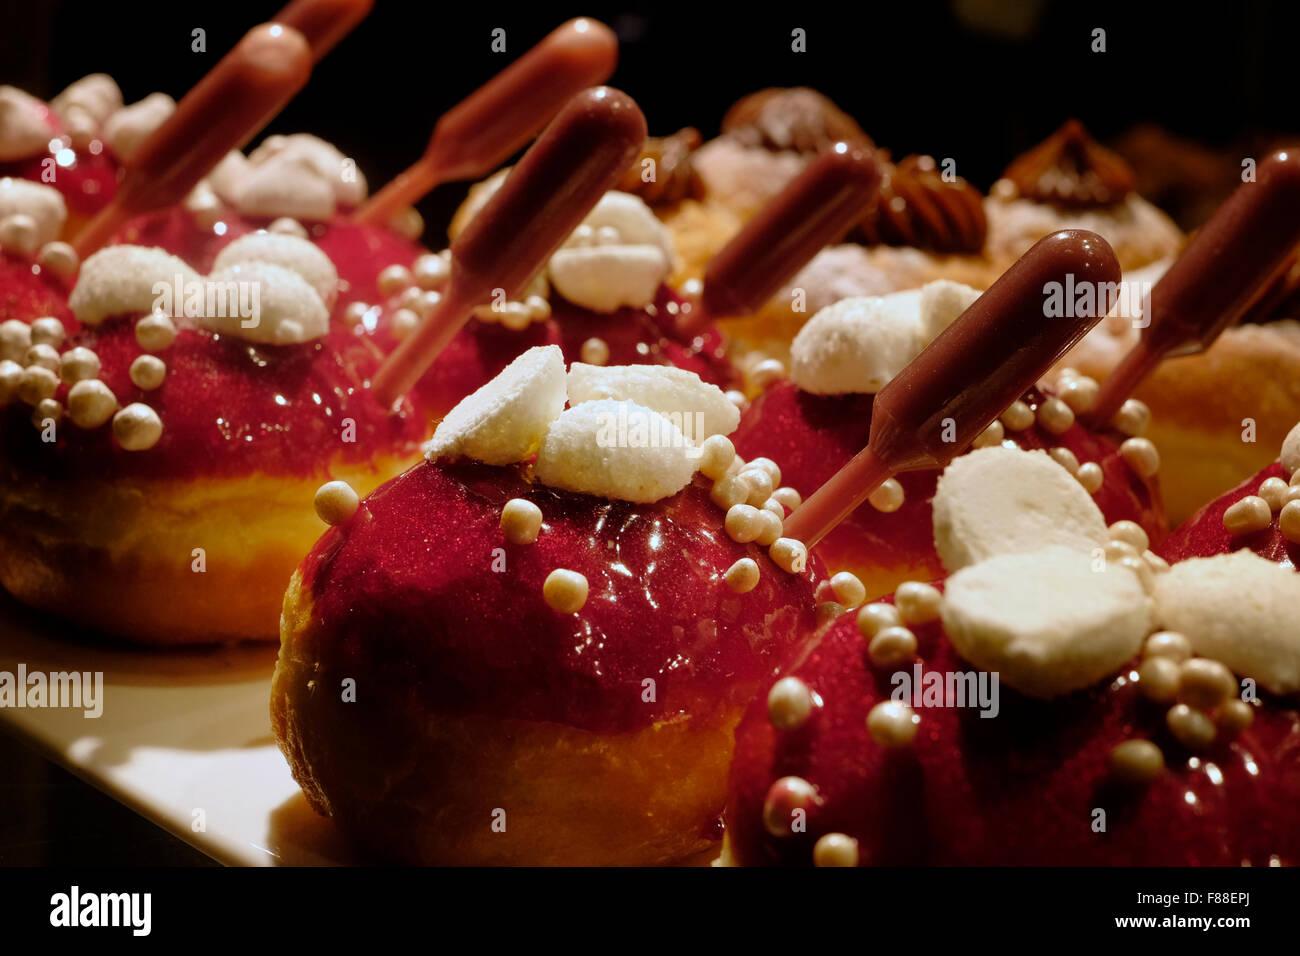 Elegantly traditional Sufganiyot deep fried round doughnut eaten during Hanukkah Jewish feast - Stock Image